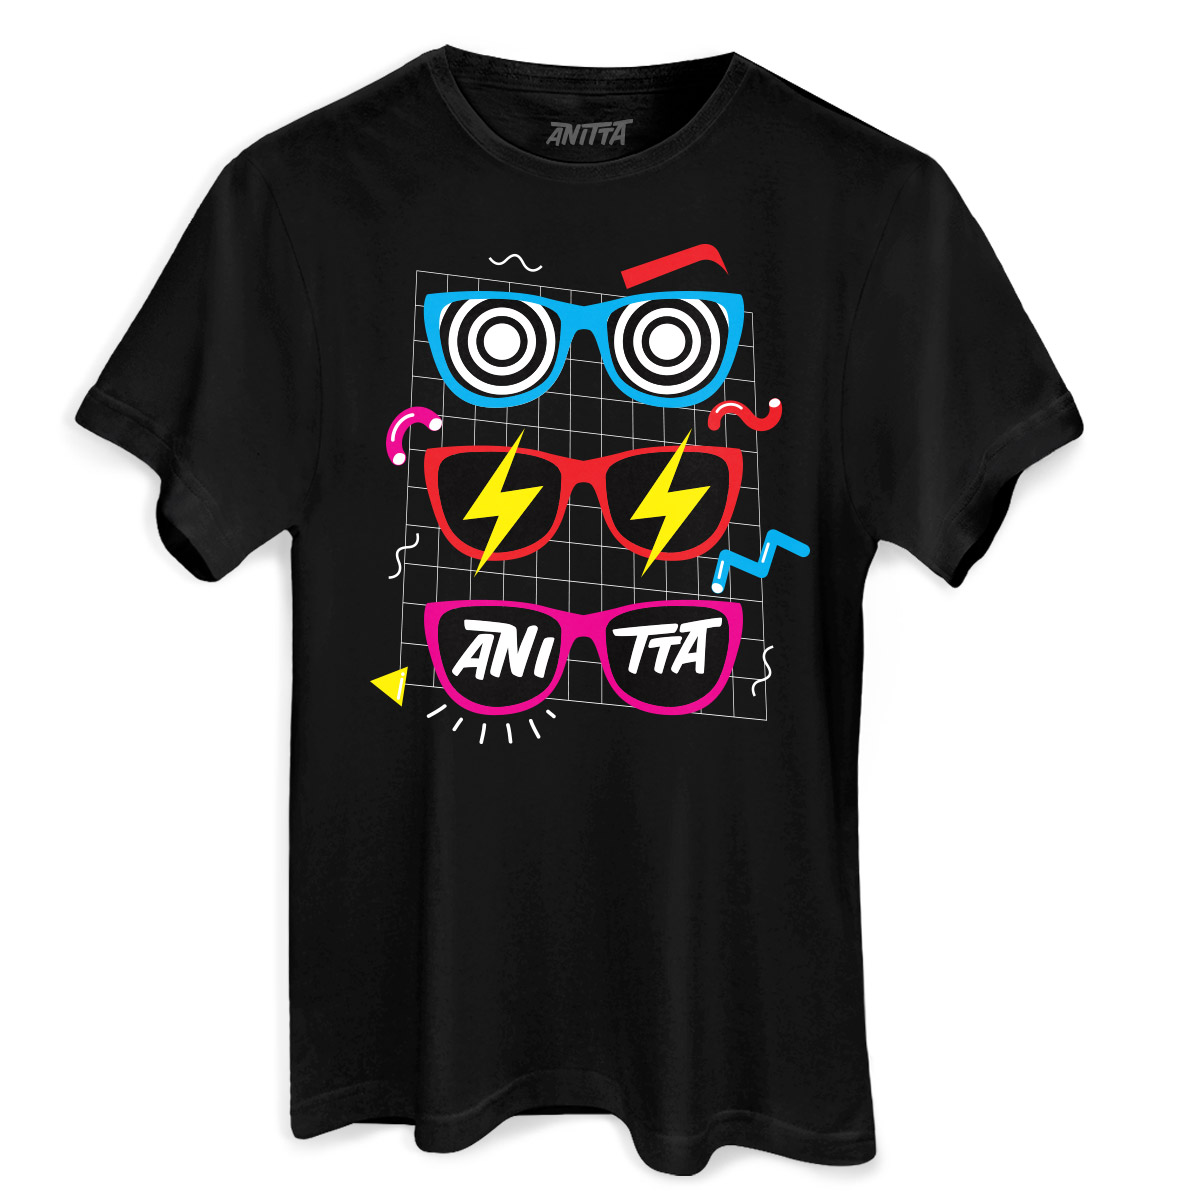 Camiseta Masculina Anitta Glasses